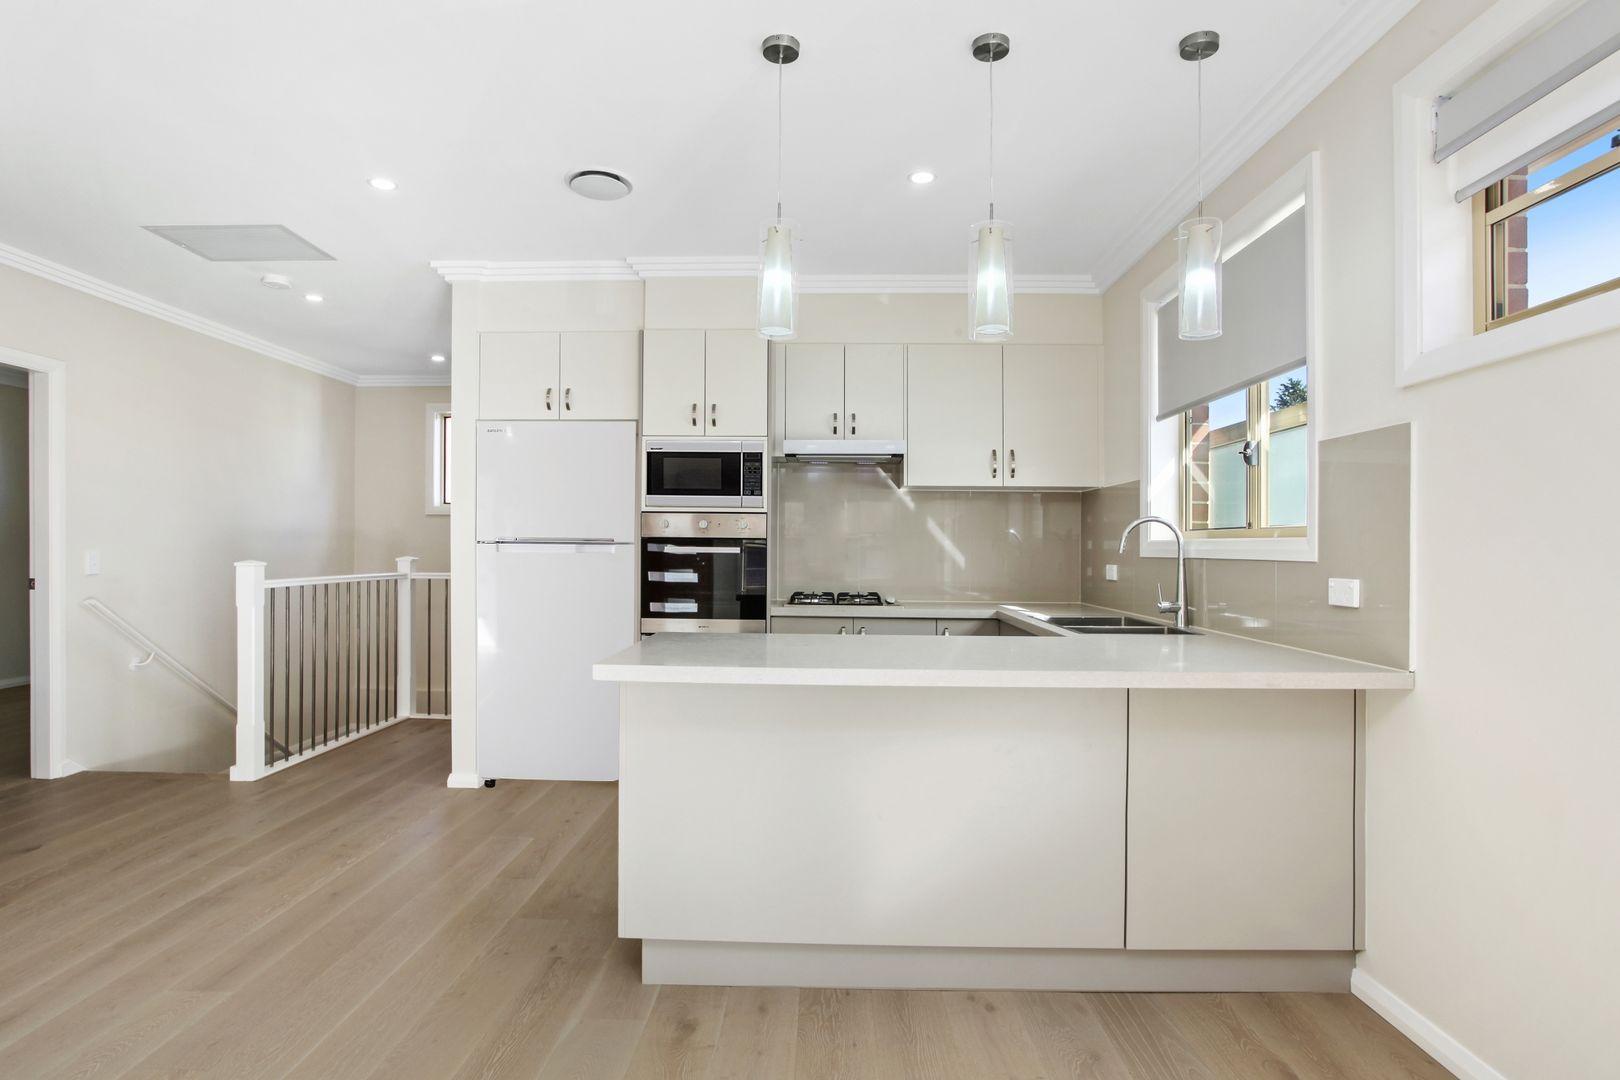 11/5 Wascoe Street, Leura NSW 2780, Image 1